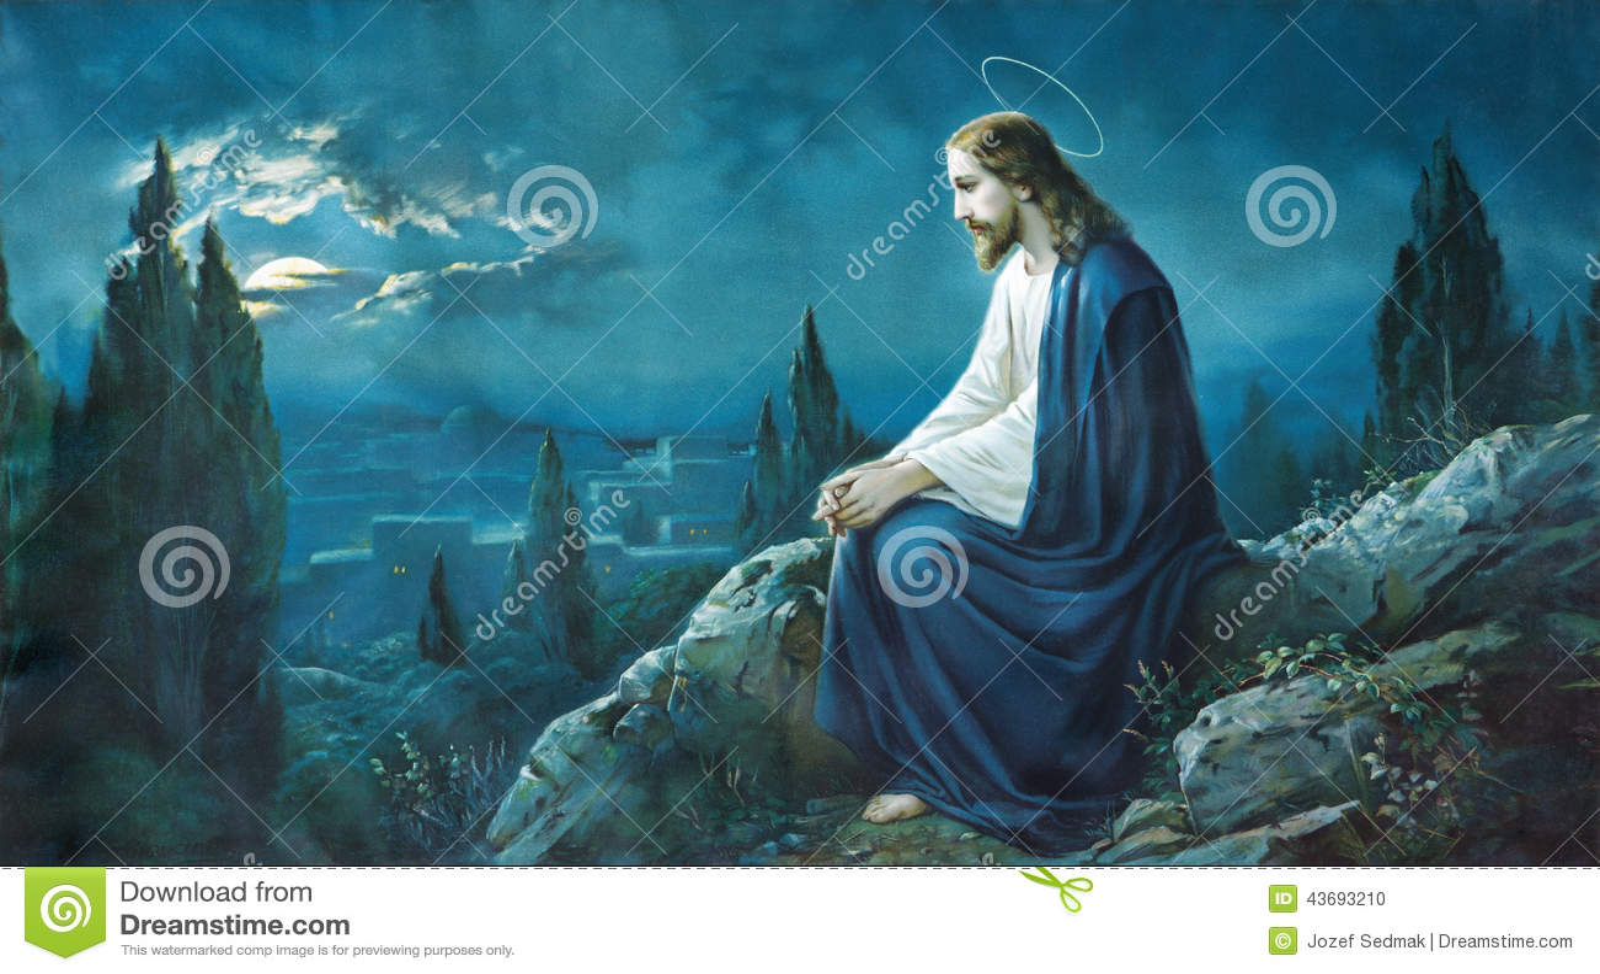 The prayer of jesus in the gethsemane garden typical - Jesus in the garden of gethsemane ...